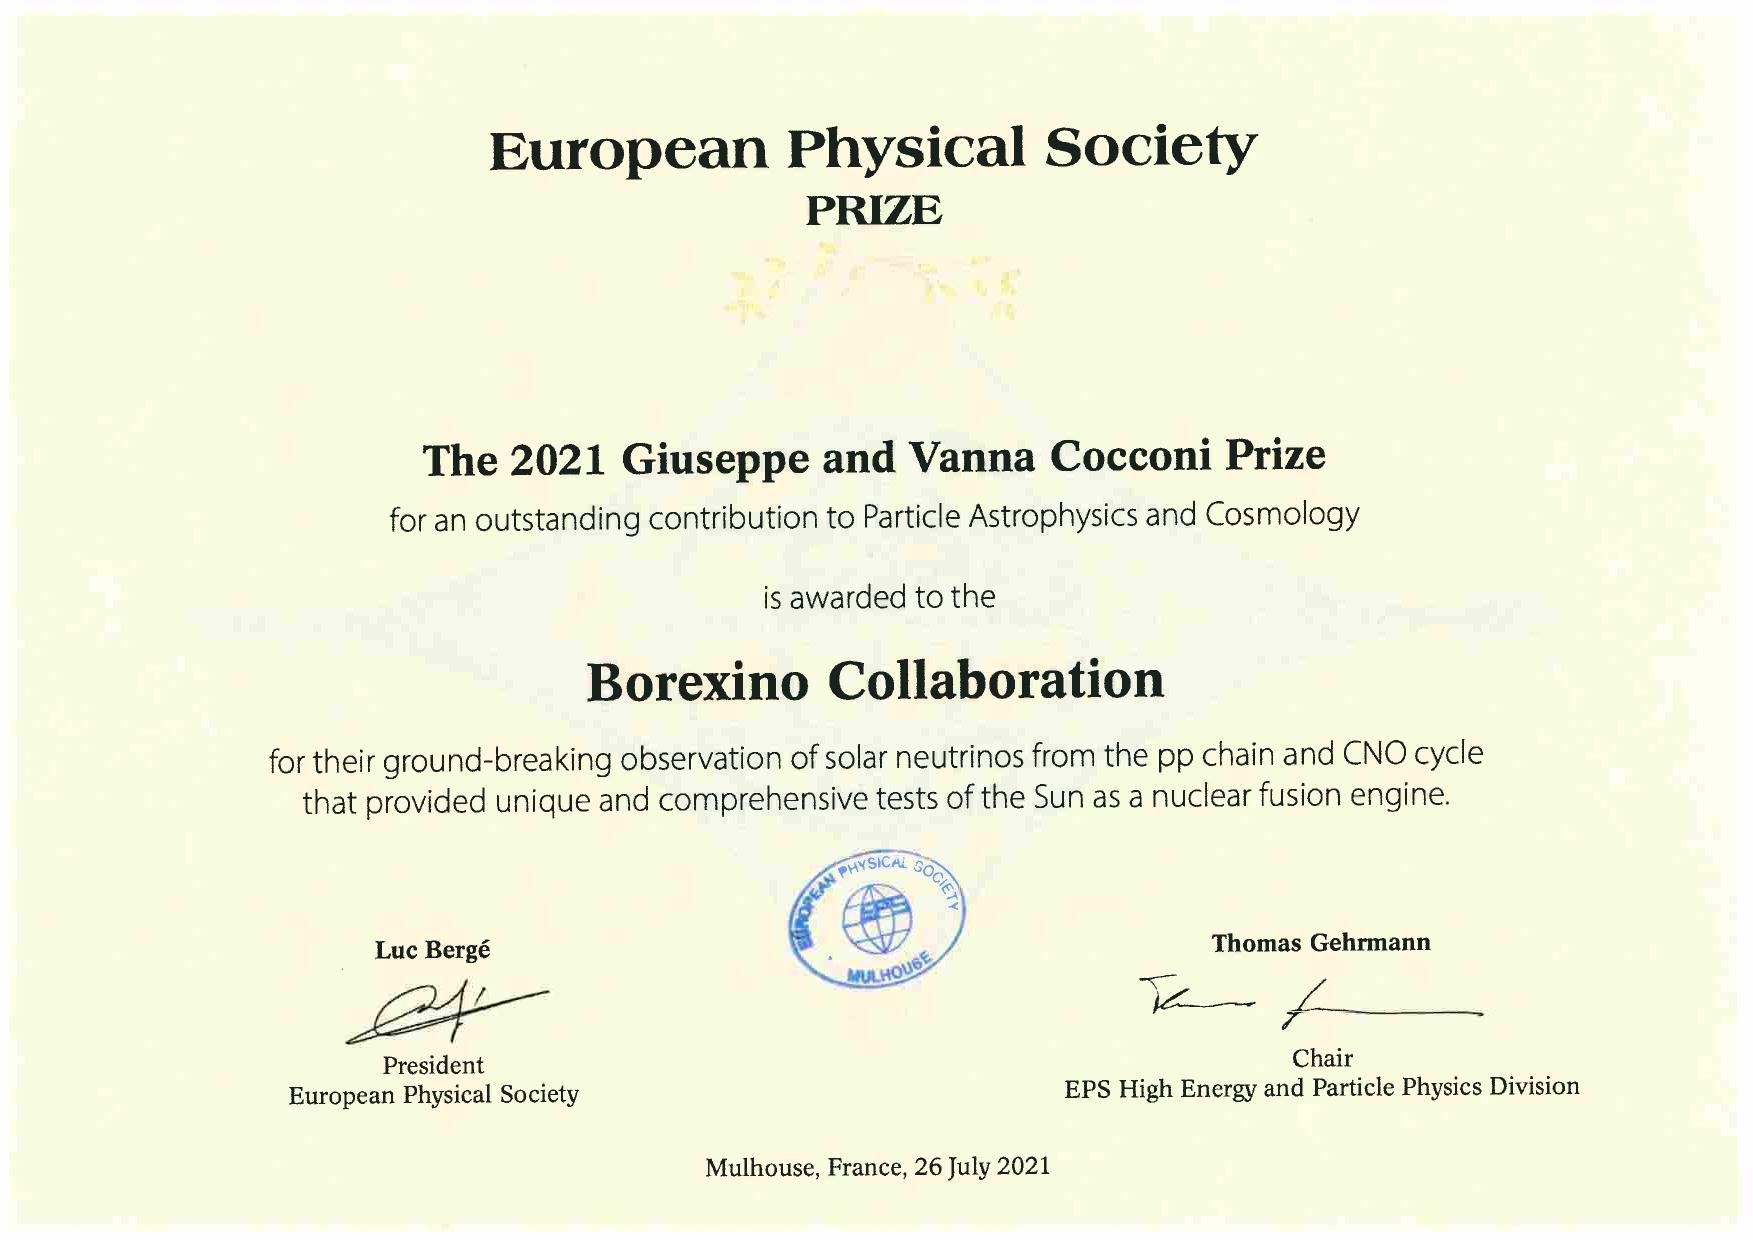 Cocconi Award certificate